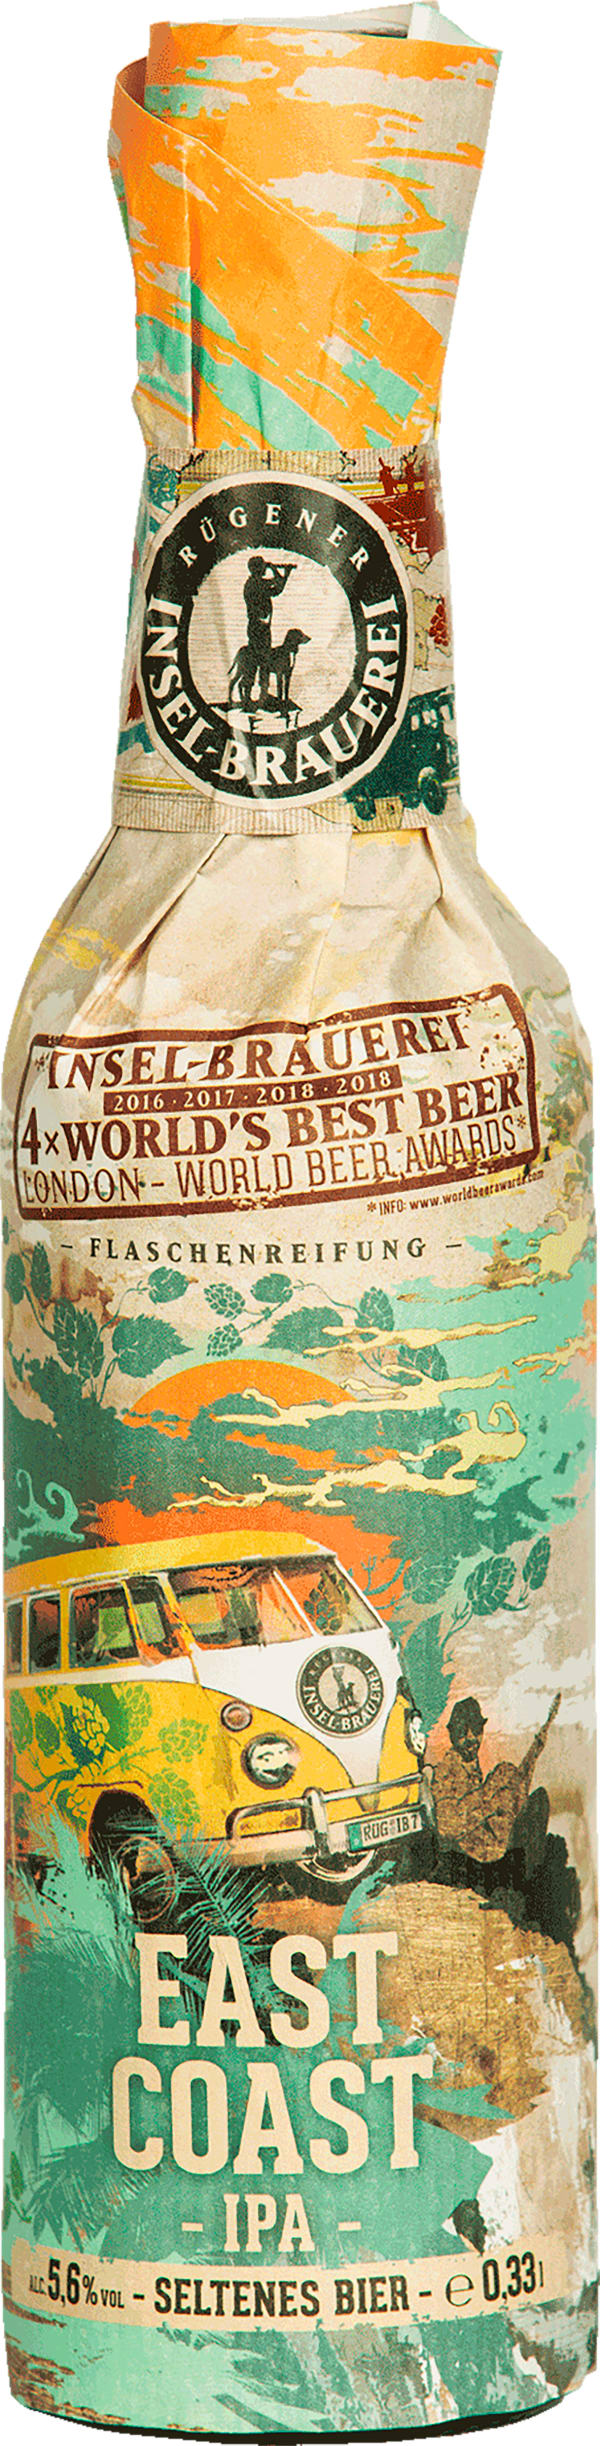 Rugener Insel-Brauerei East Coast IPA